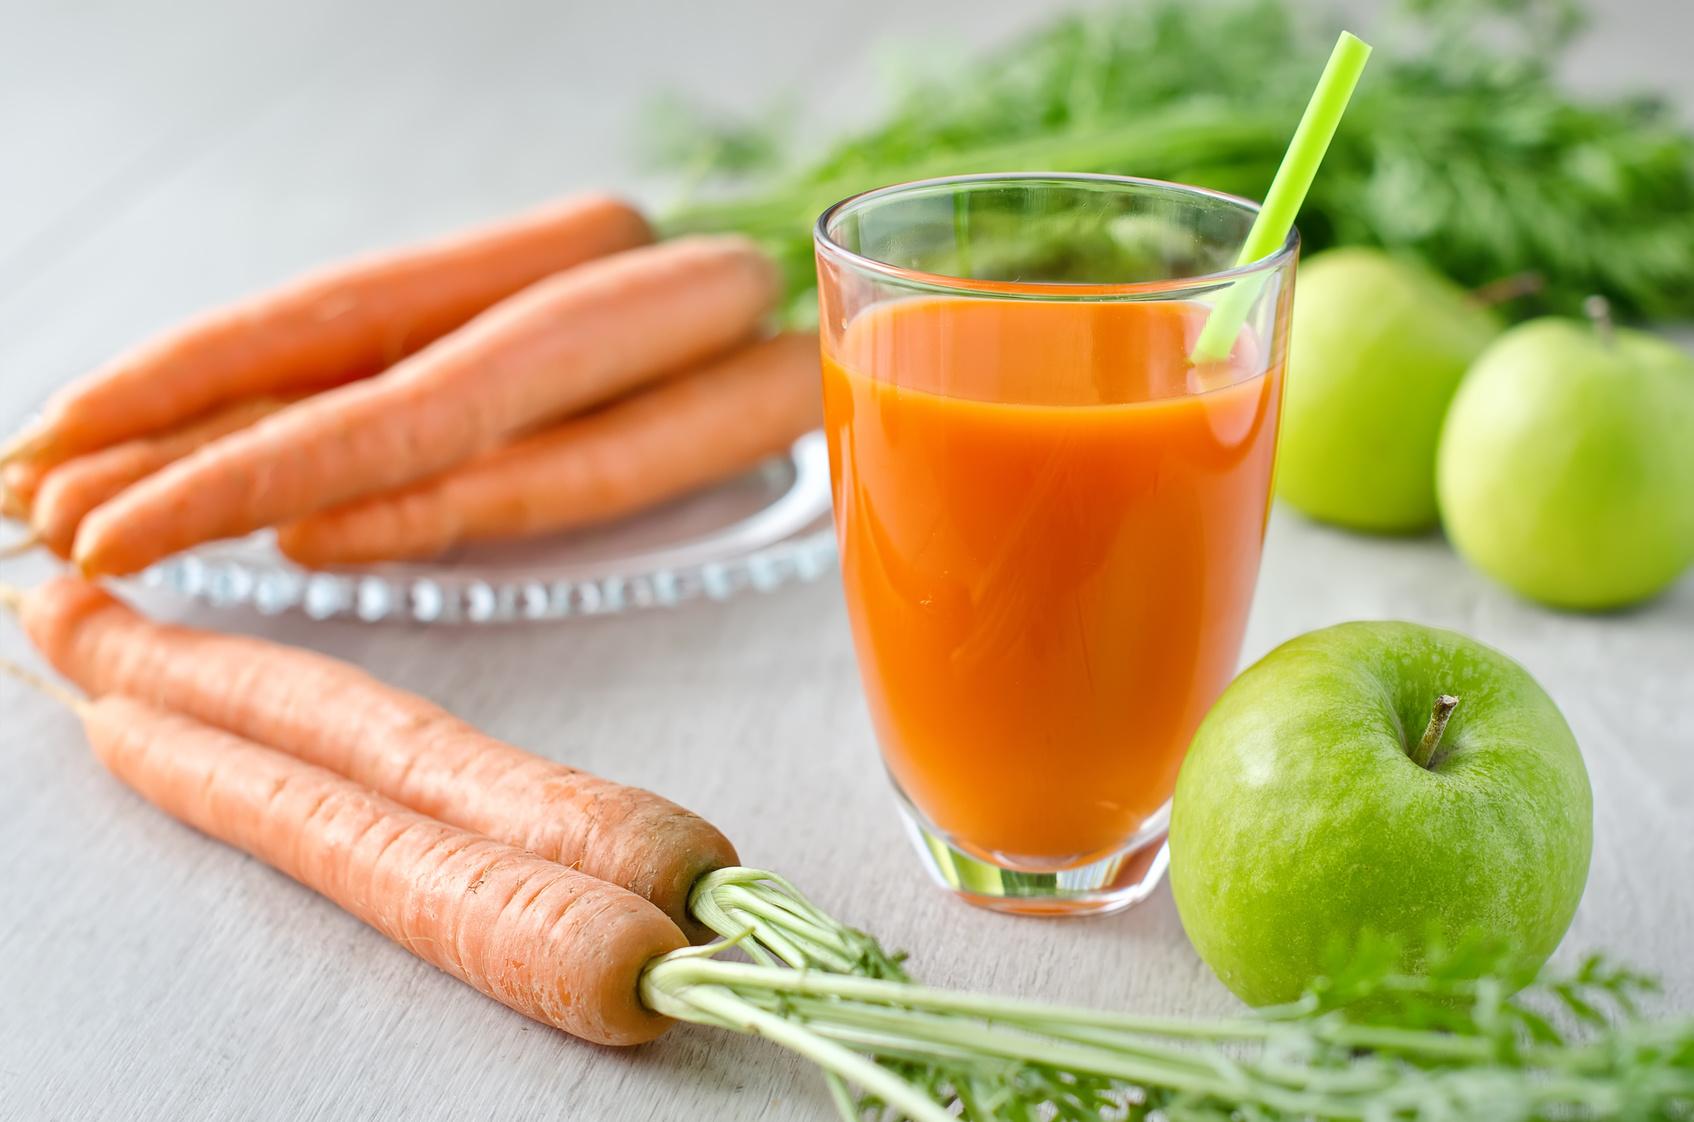 licuado de verduras nutritivos